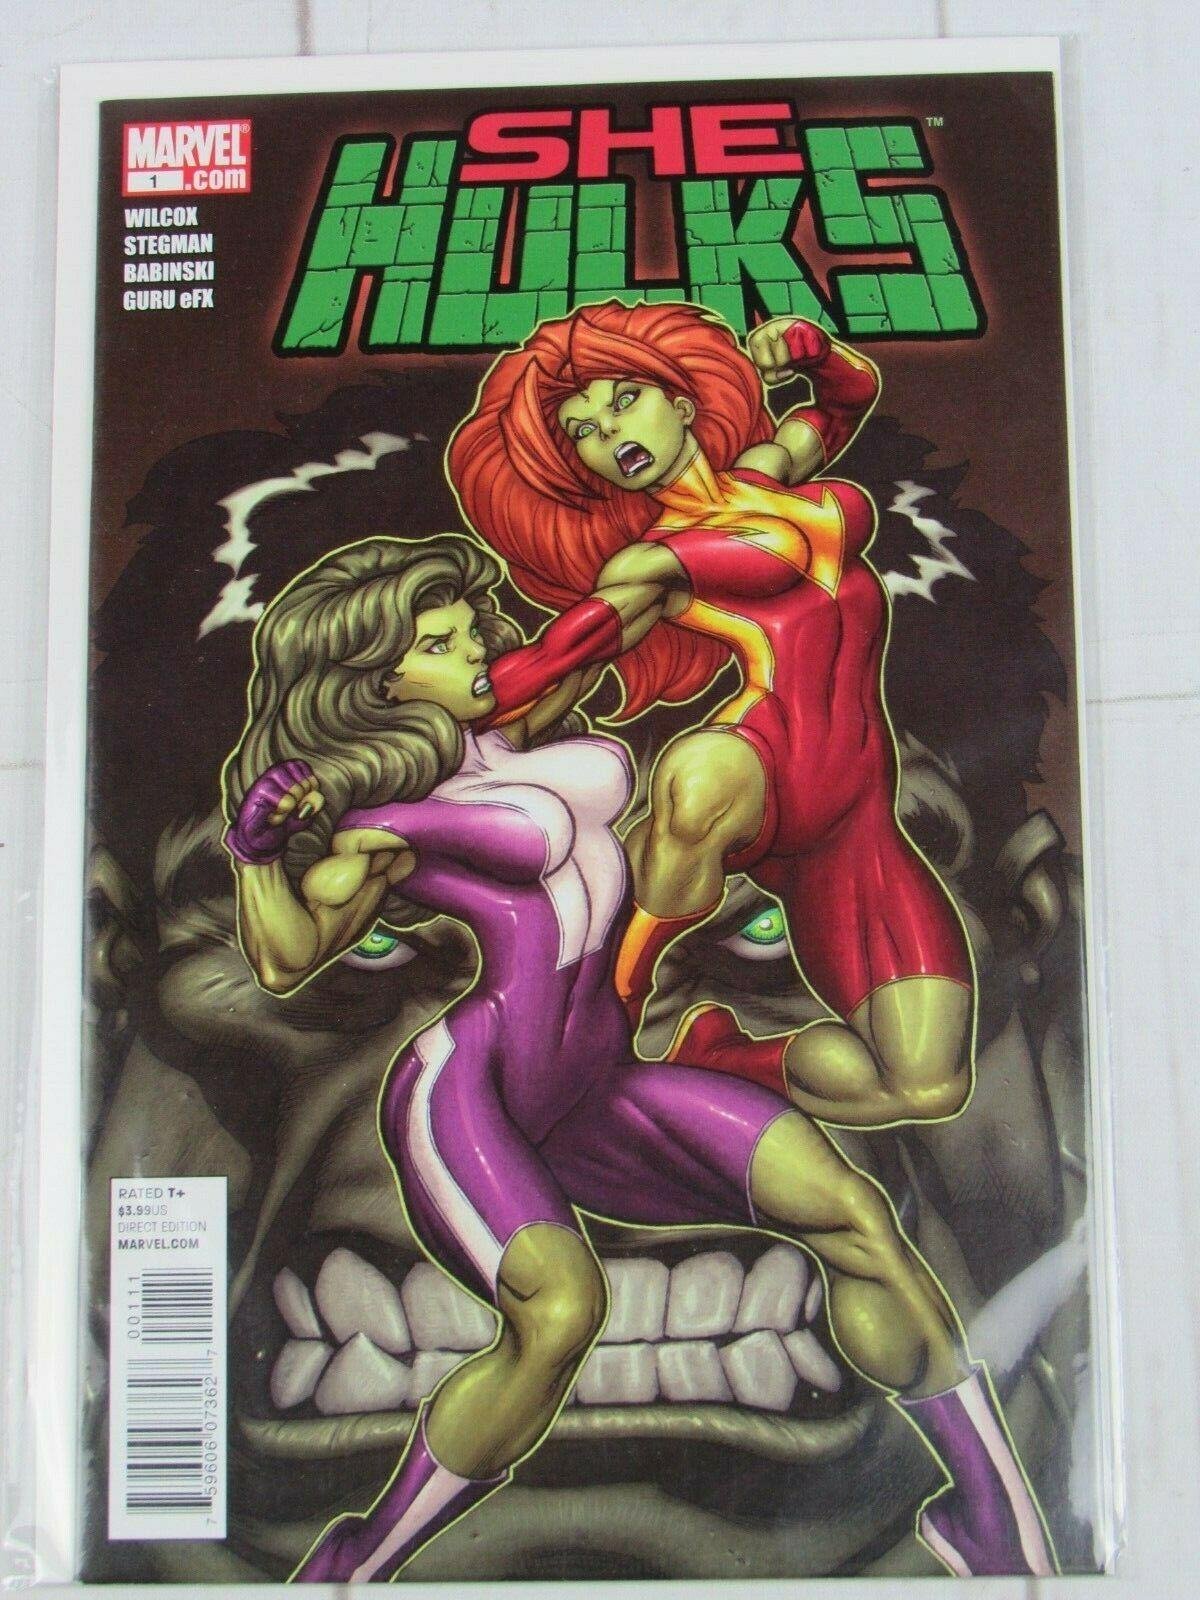 She-Hulks #1 Ed McGuiness Cover Marvel 2011 - C5259